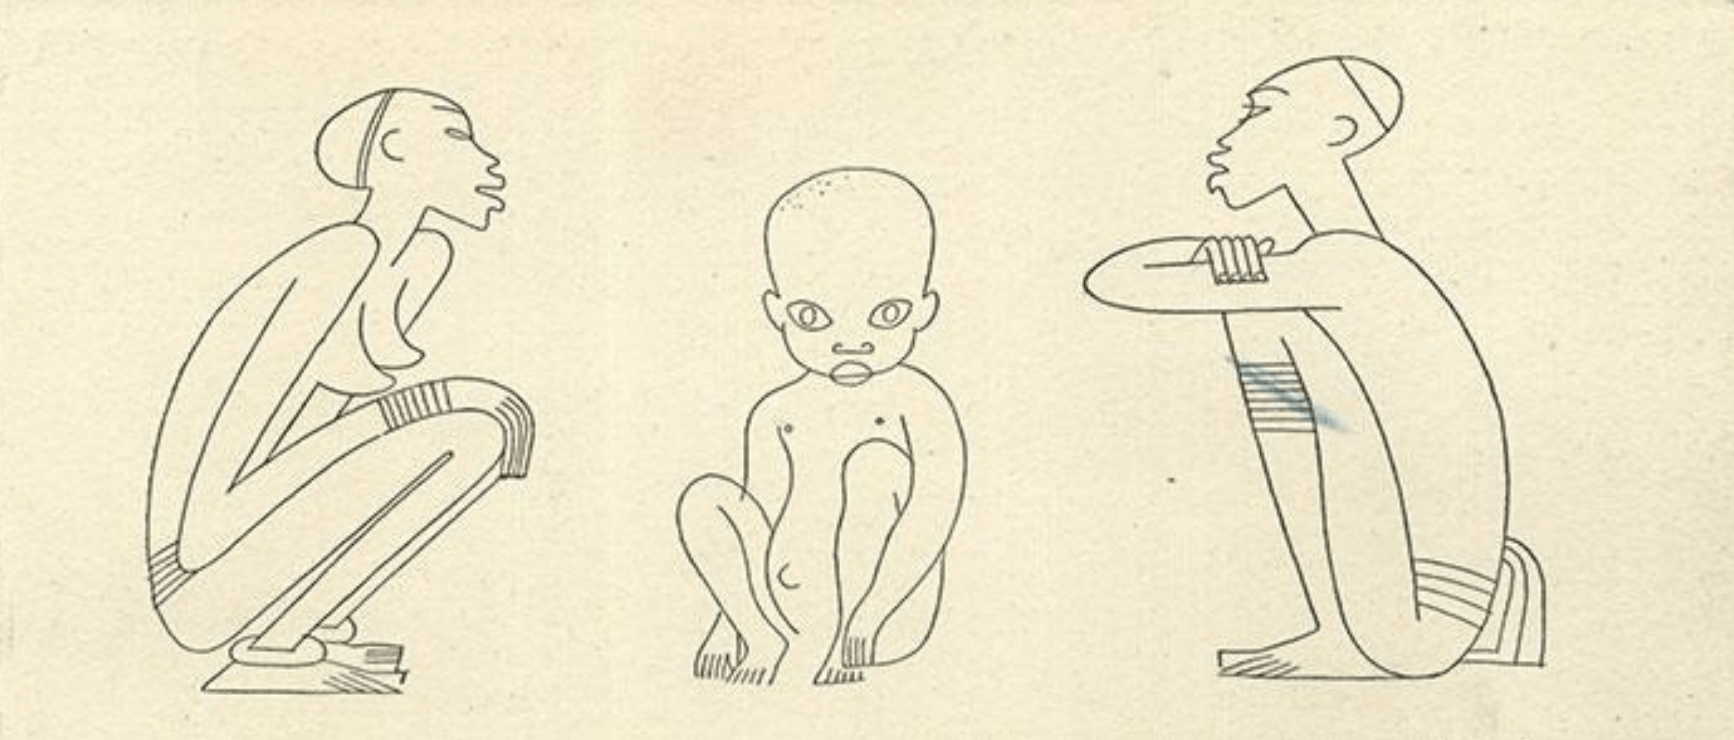 Esquisses De Miguel COVARRUBIAS5, René Maran